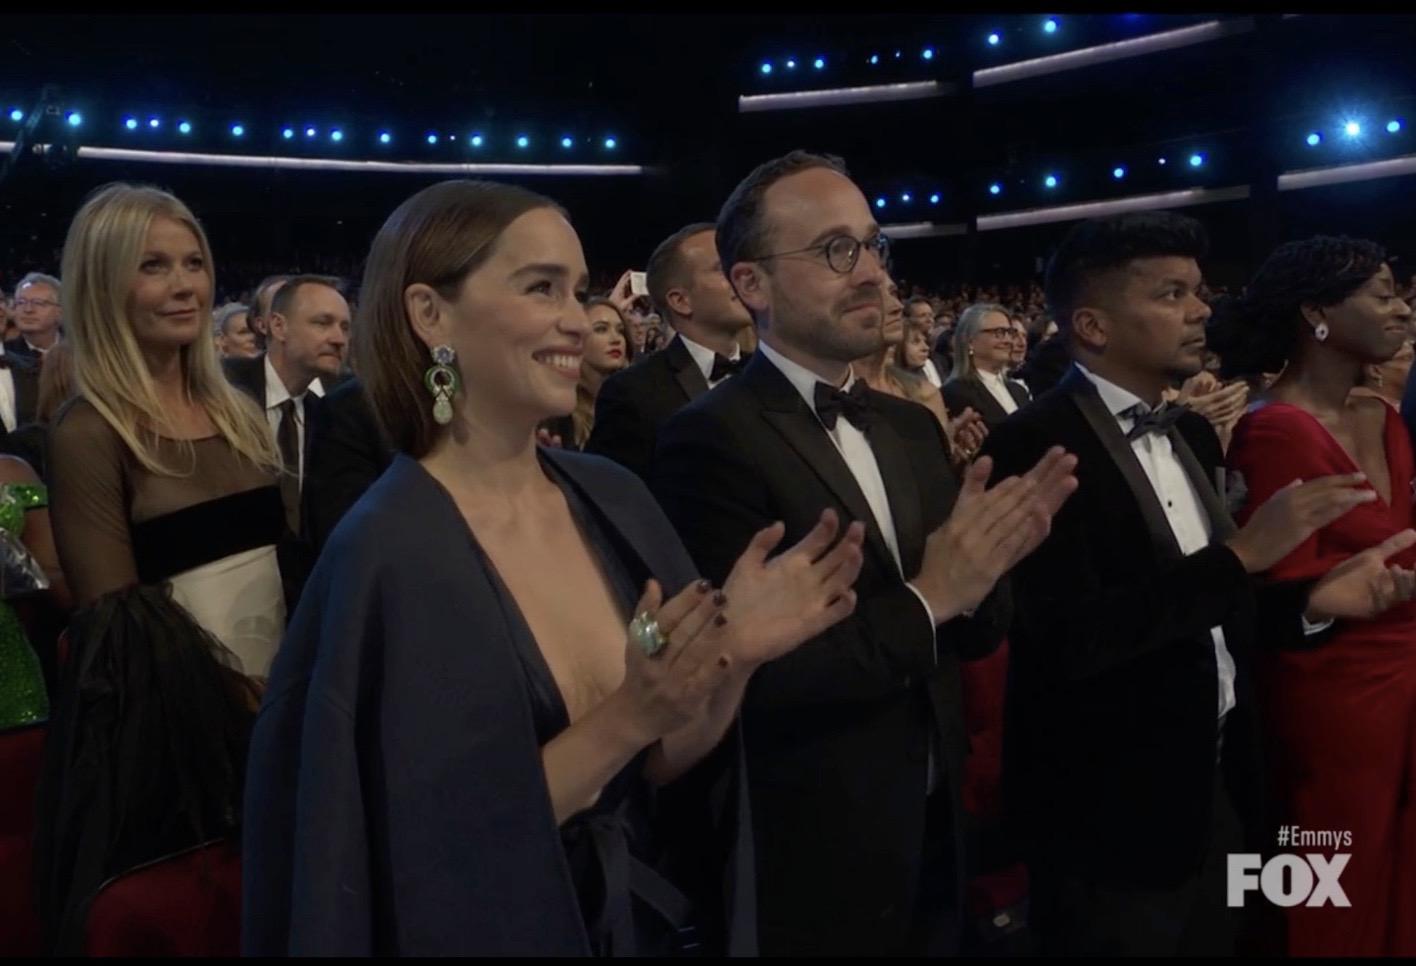 Gwyneth Paltrow, Pravin Shaw, and Emilia Clarke in The 71st Primetime Emmy Awards (2019)